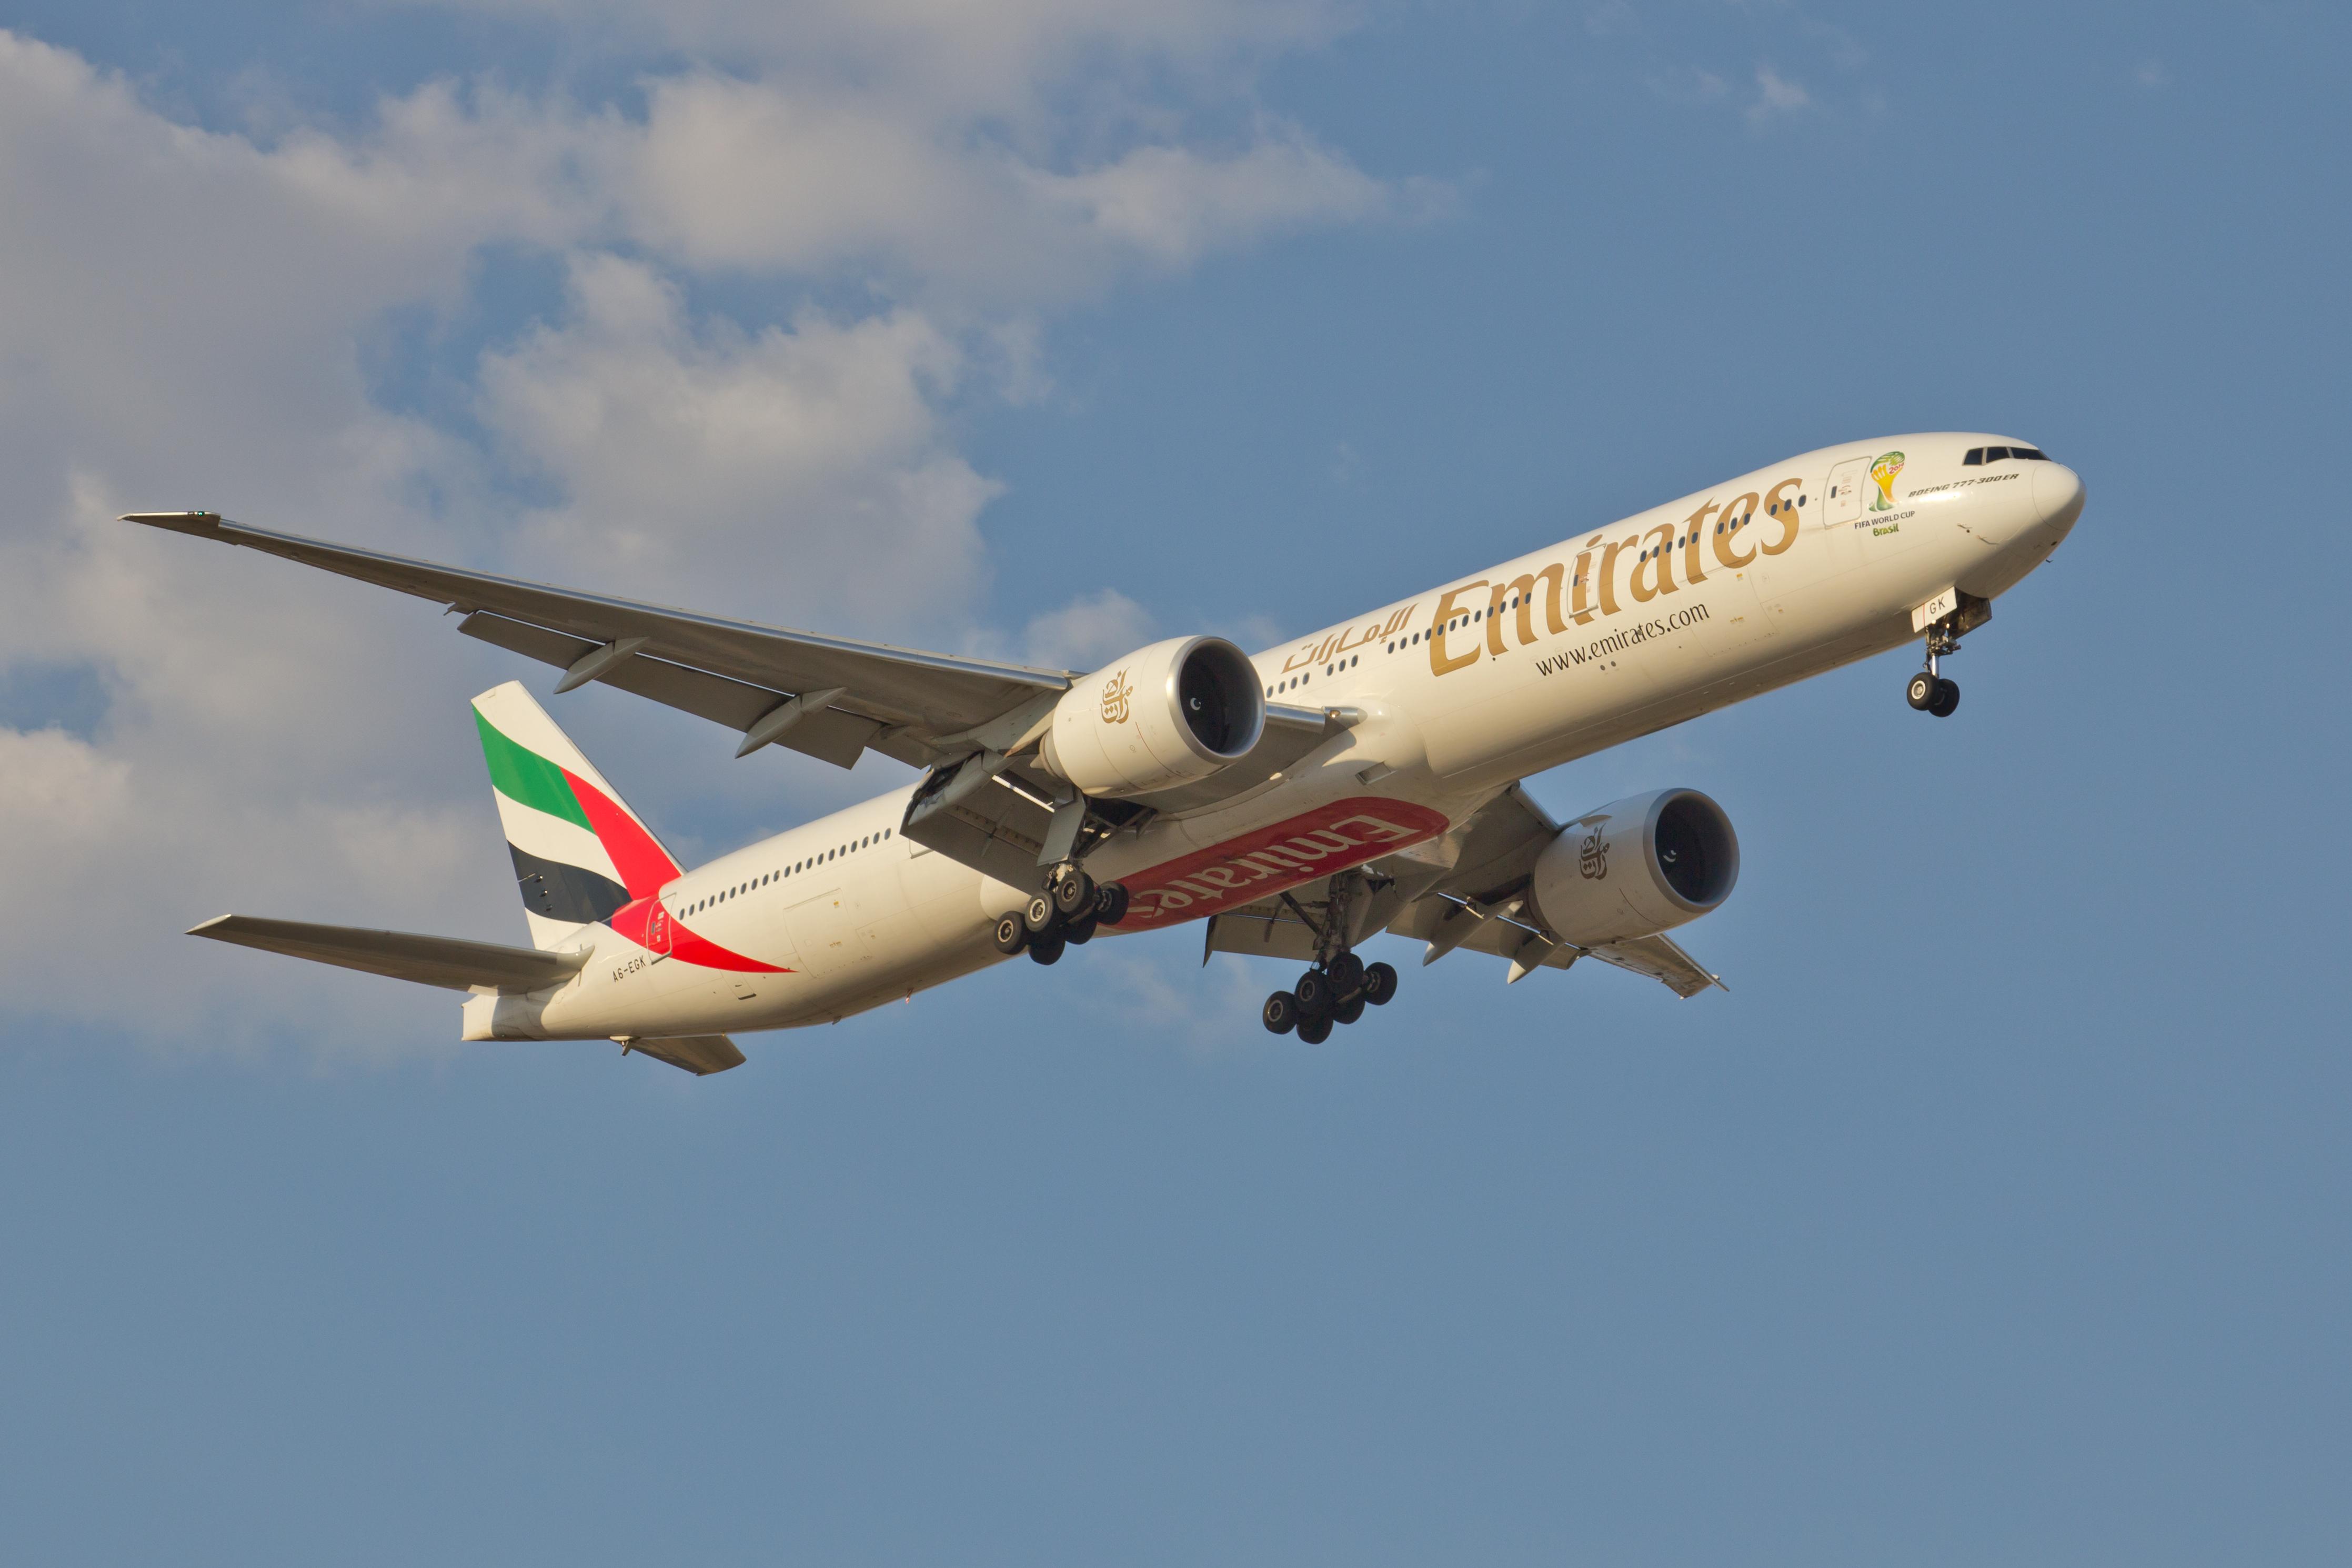 Drawn aircraft emirates #12